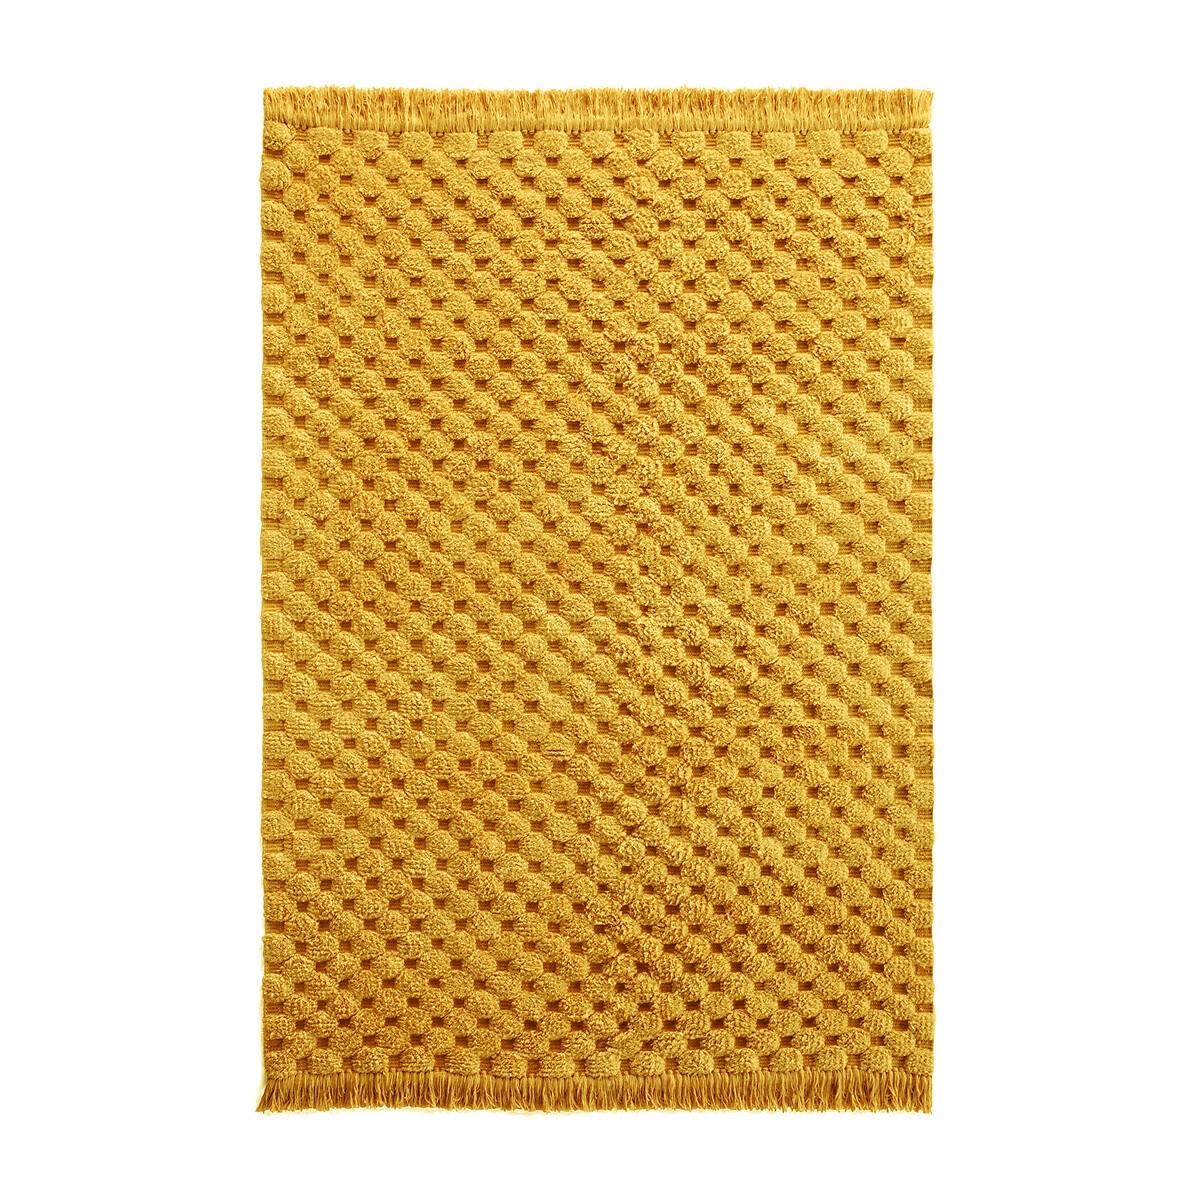 Ковер LaRedoute Детский из хлопка Pundana 120 x 180 см желтый